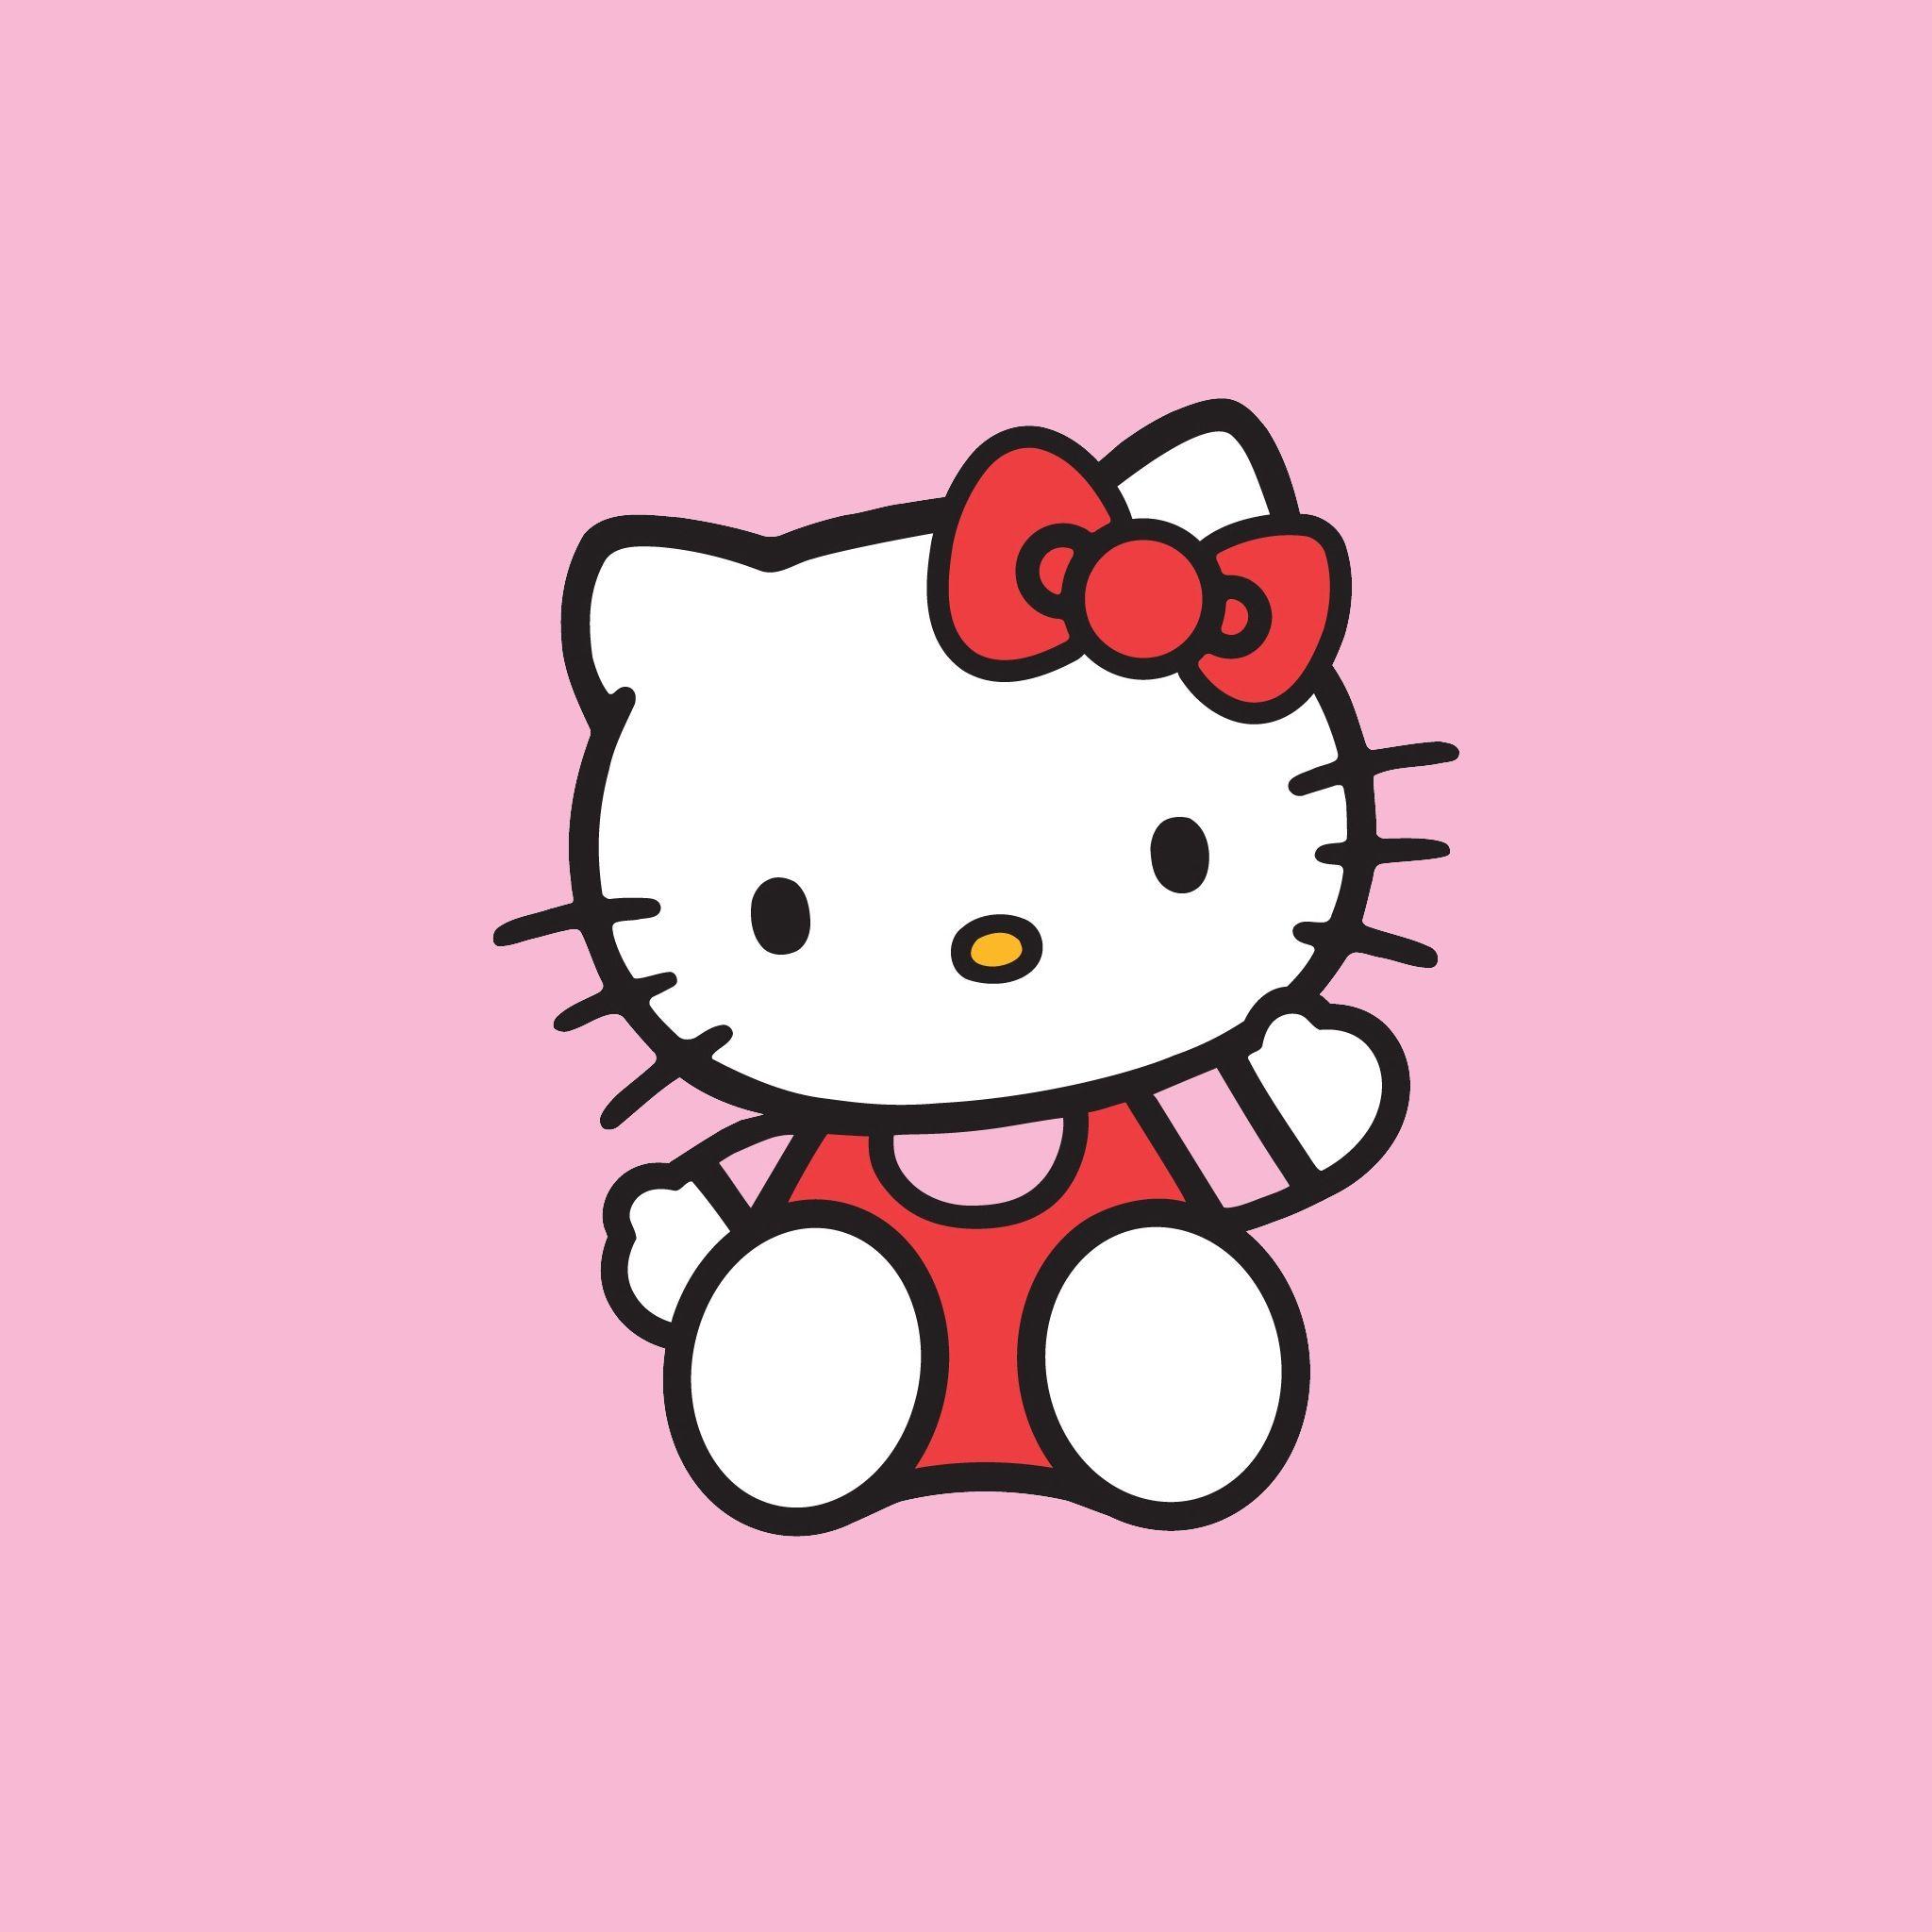 Pin By Chanikarn Suwankanthorn On Hello Kitty Hello Kitty Printables Hello Kitty Cartoon Hello Kitty Characters